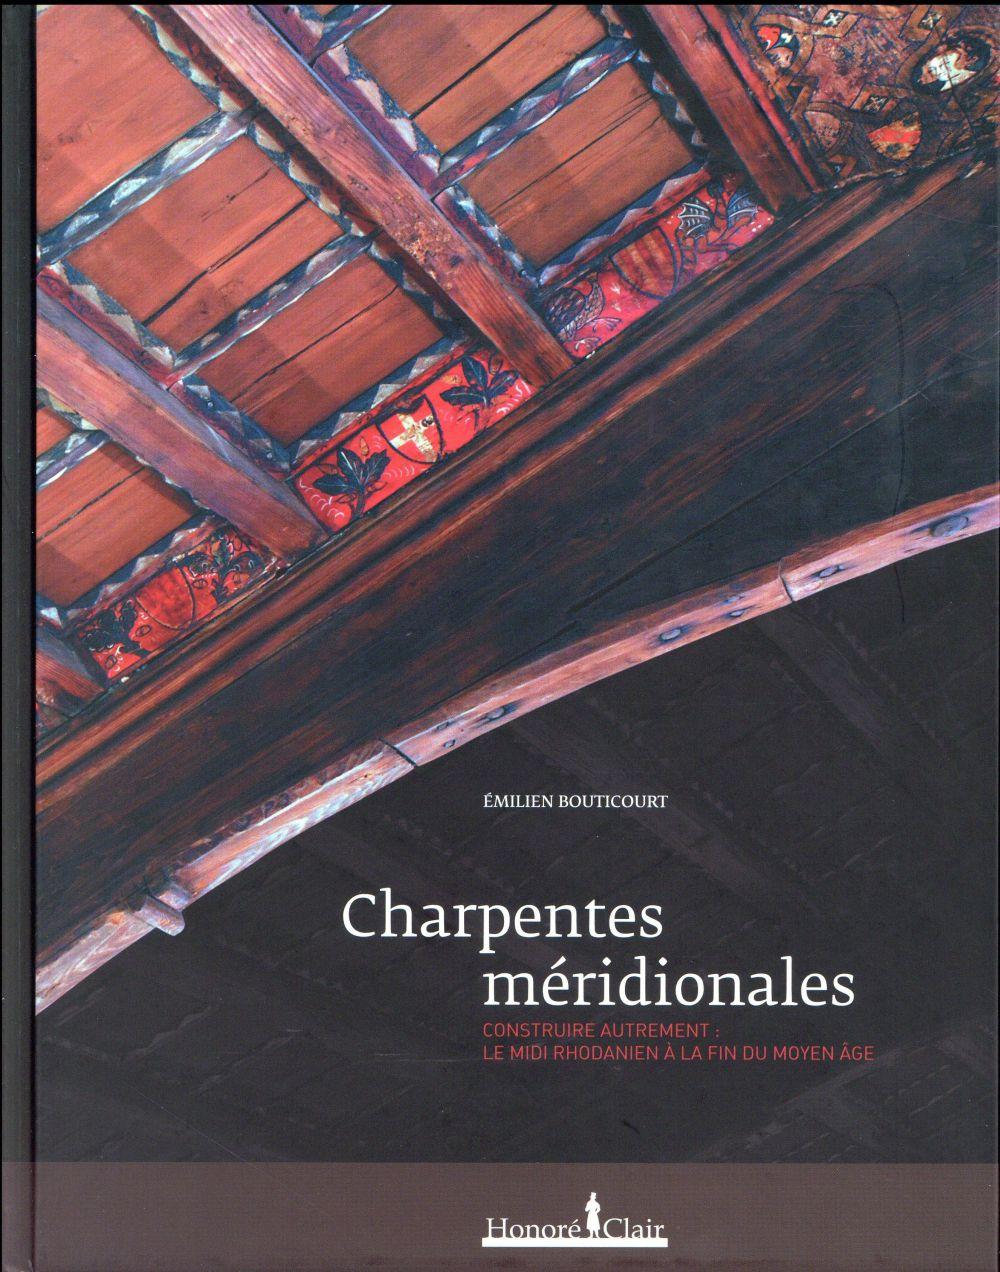 CHARPENTES MERIDIONALES : CONSTRUIRE AUTREM MIDI RHODANIEN FIN MOYEN AGE